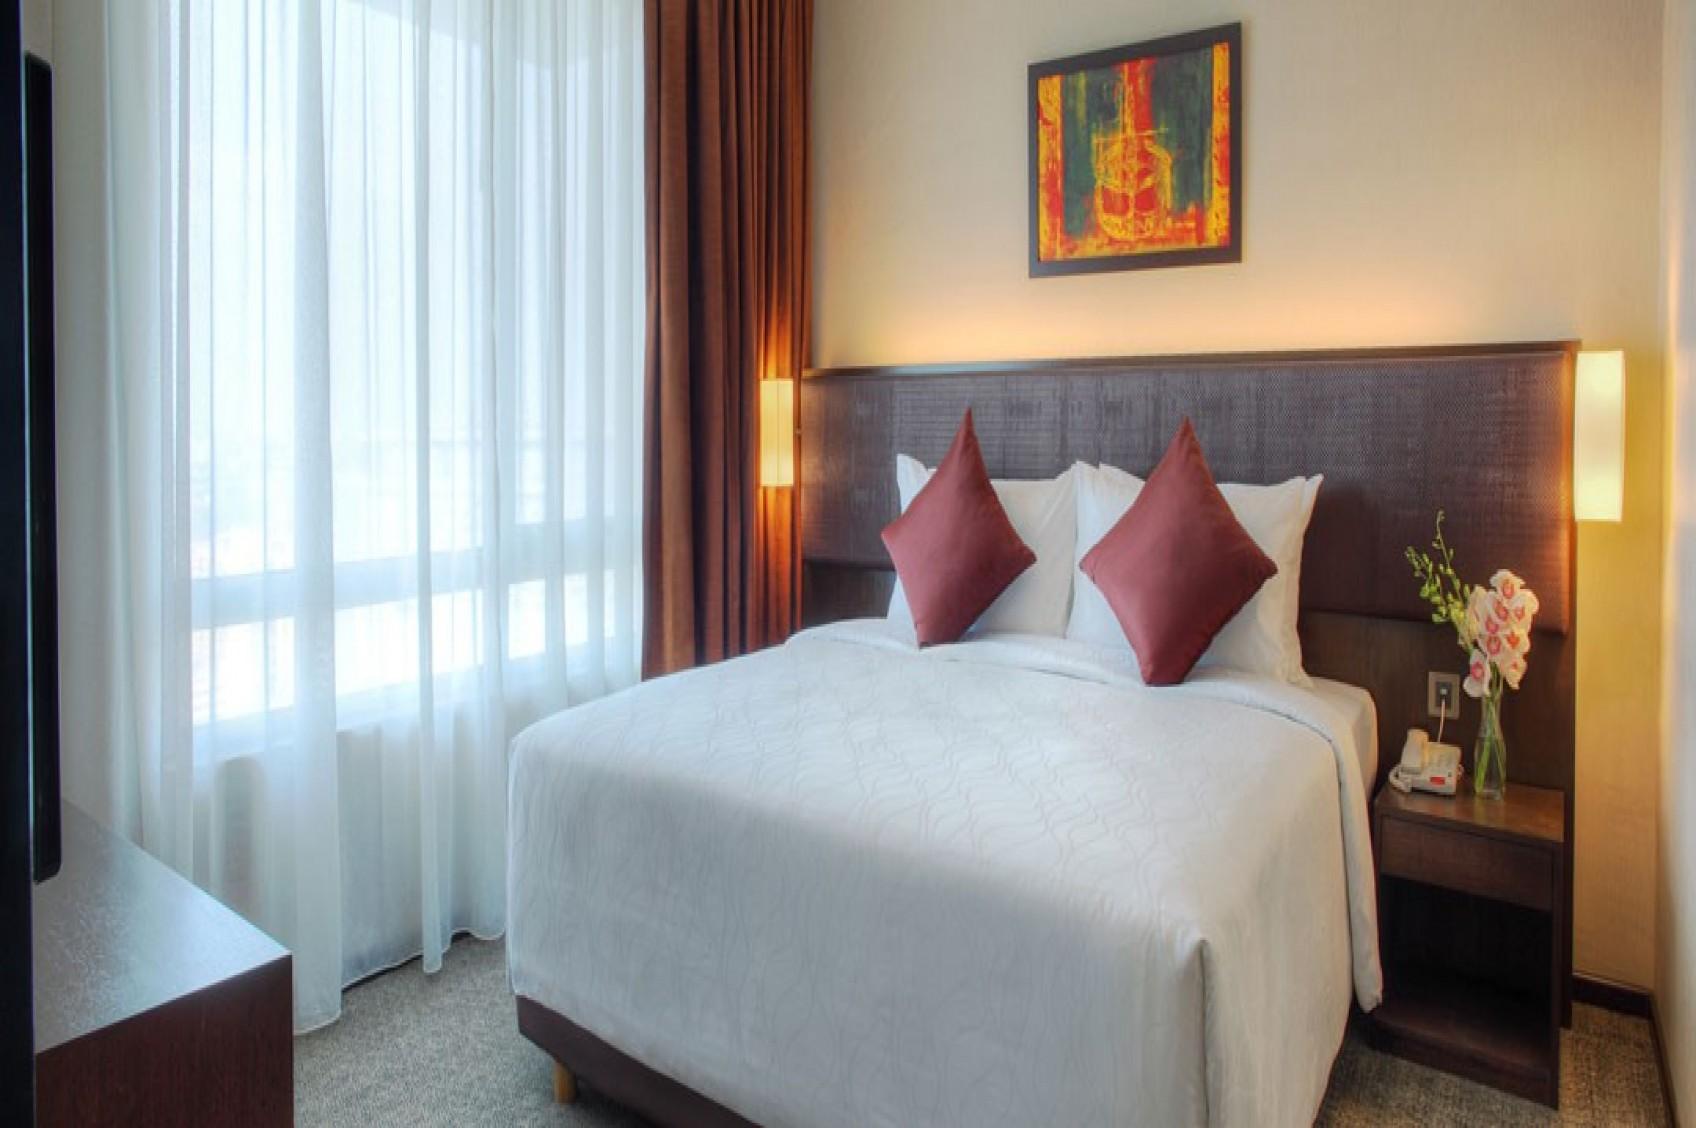 هتل فوراما بوکیت کوالالامپور